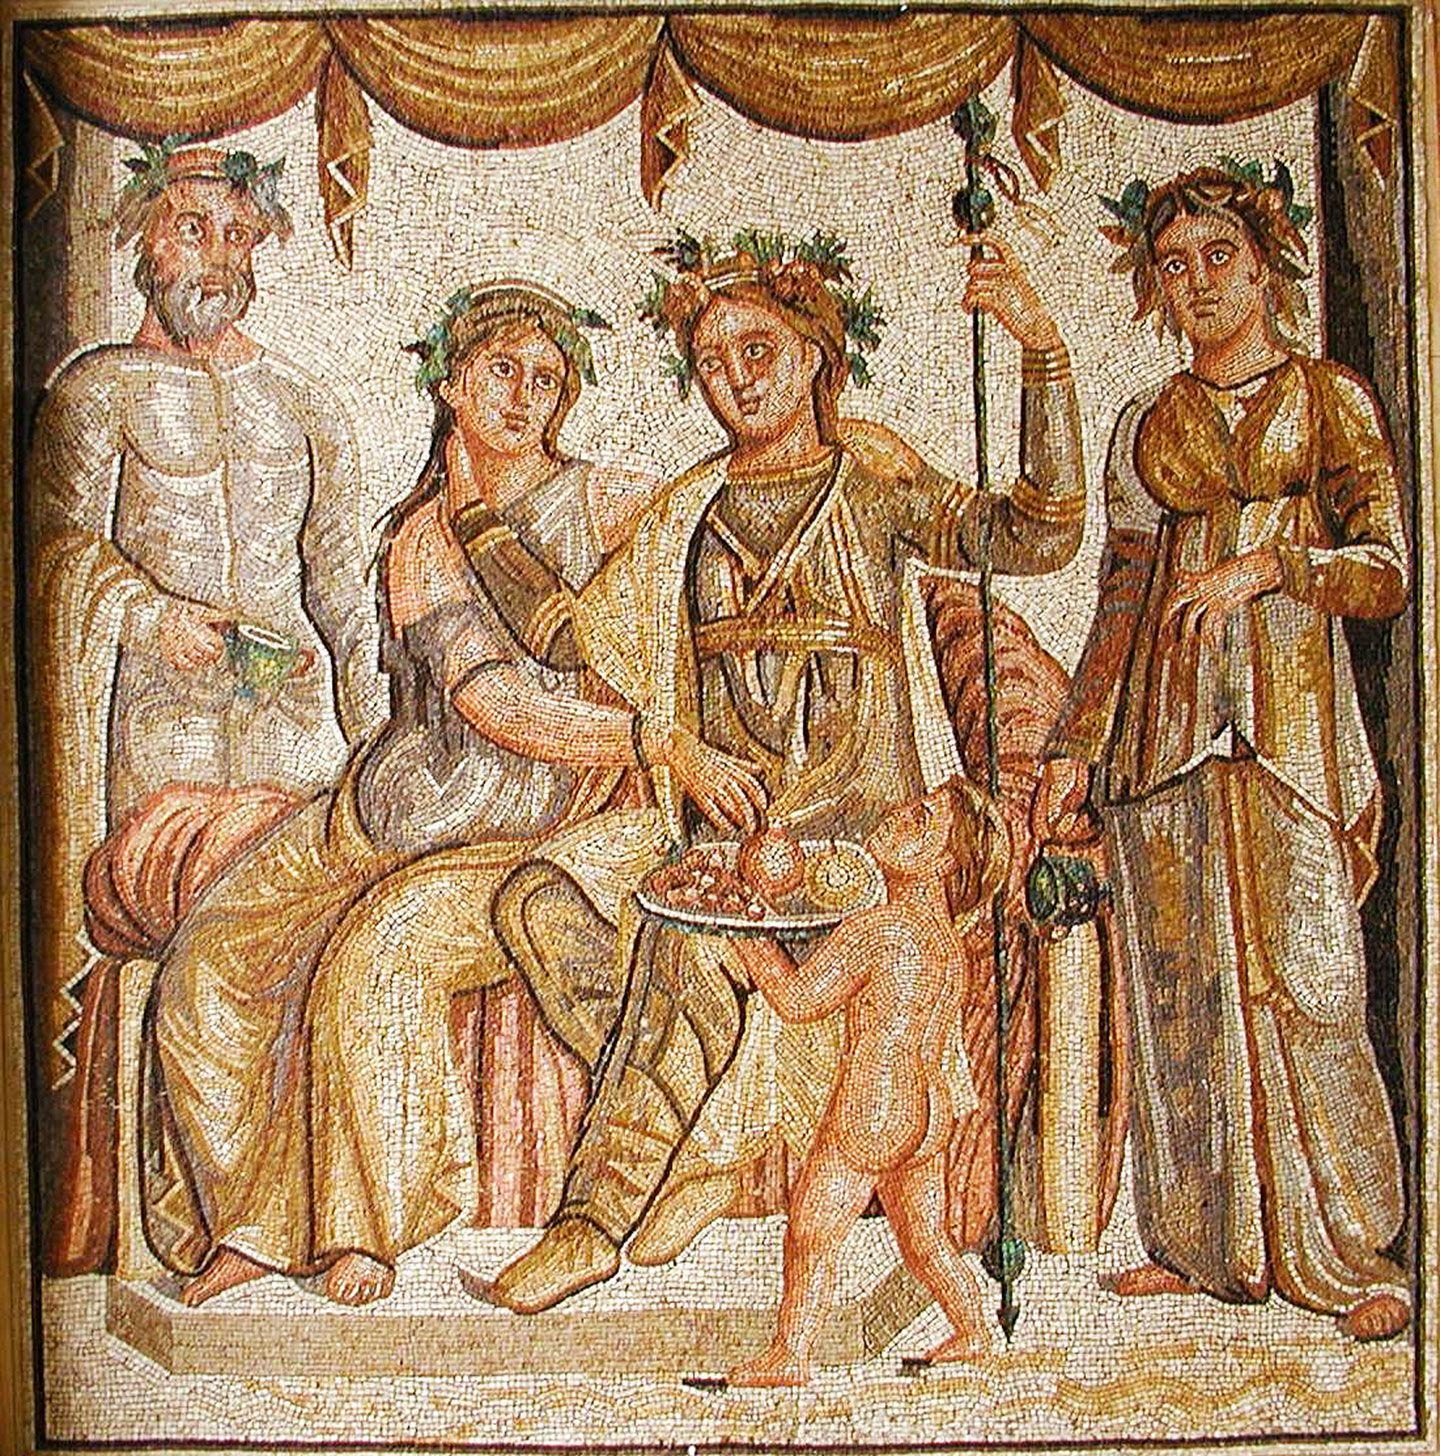 romano british mosaic - Google Search | Roman art, Roman